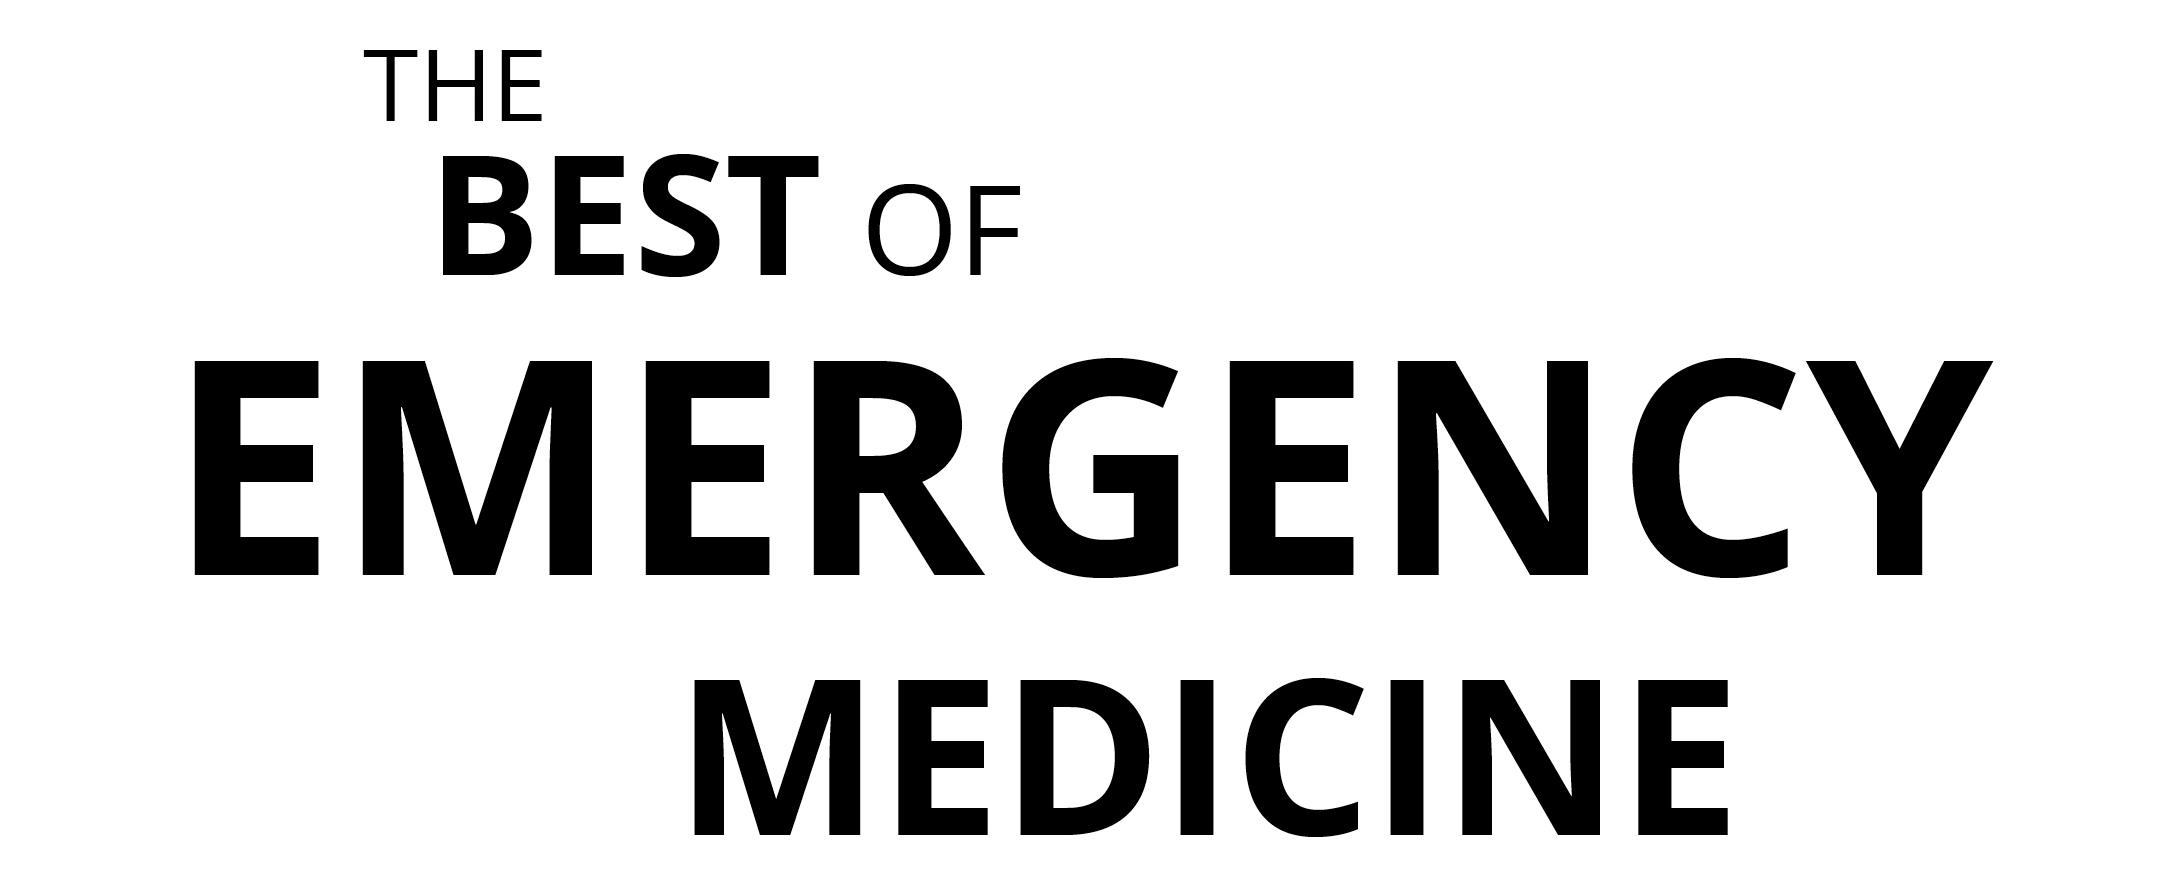 The Best of Emergency Medicine